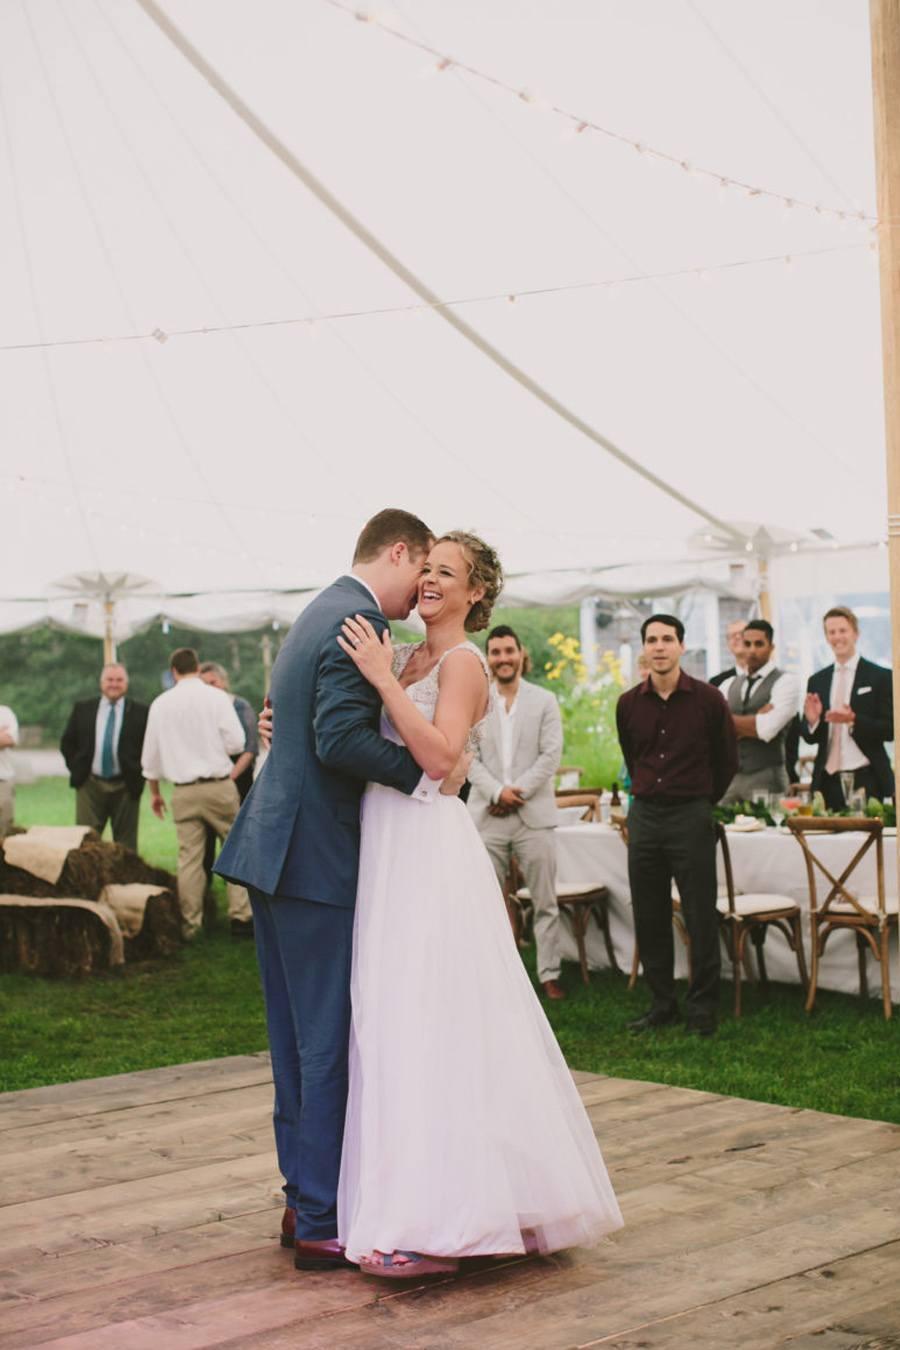 ALEXANDRA & JARED: UNA BODA MUY FAMILIAR baile-boda